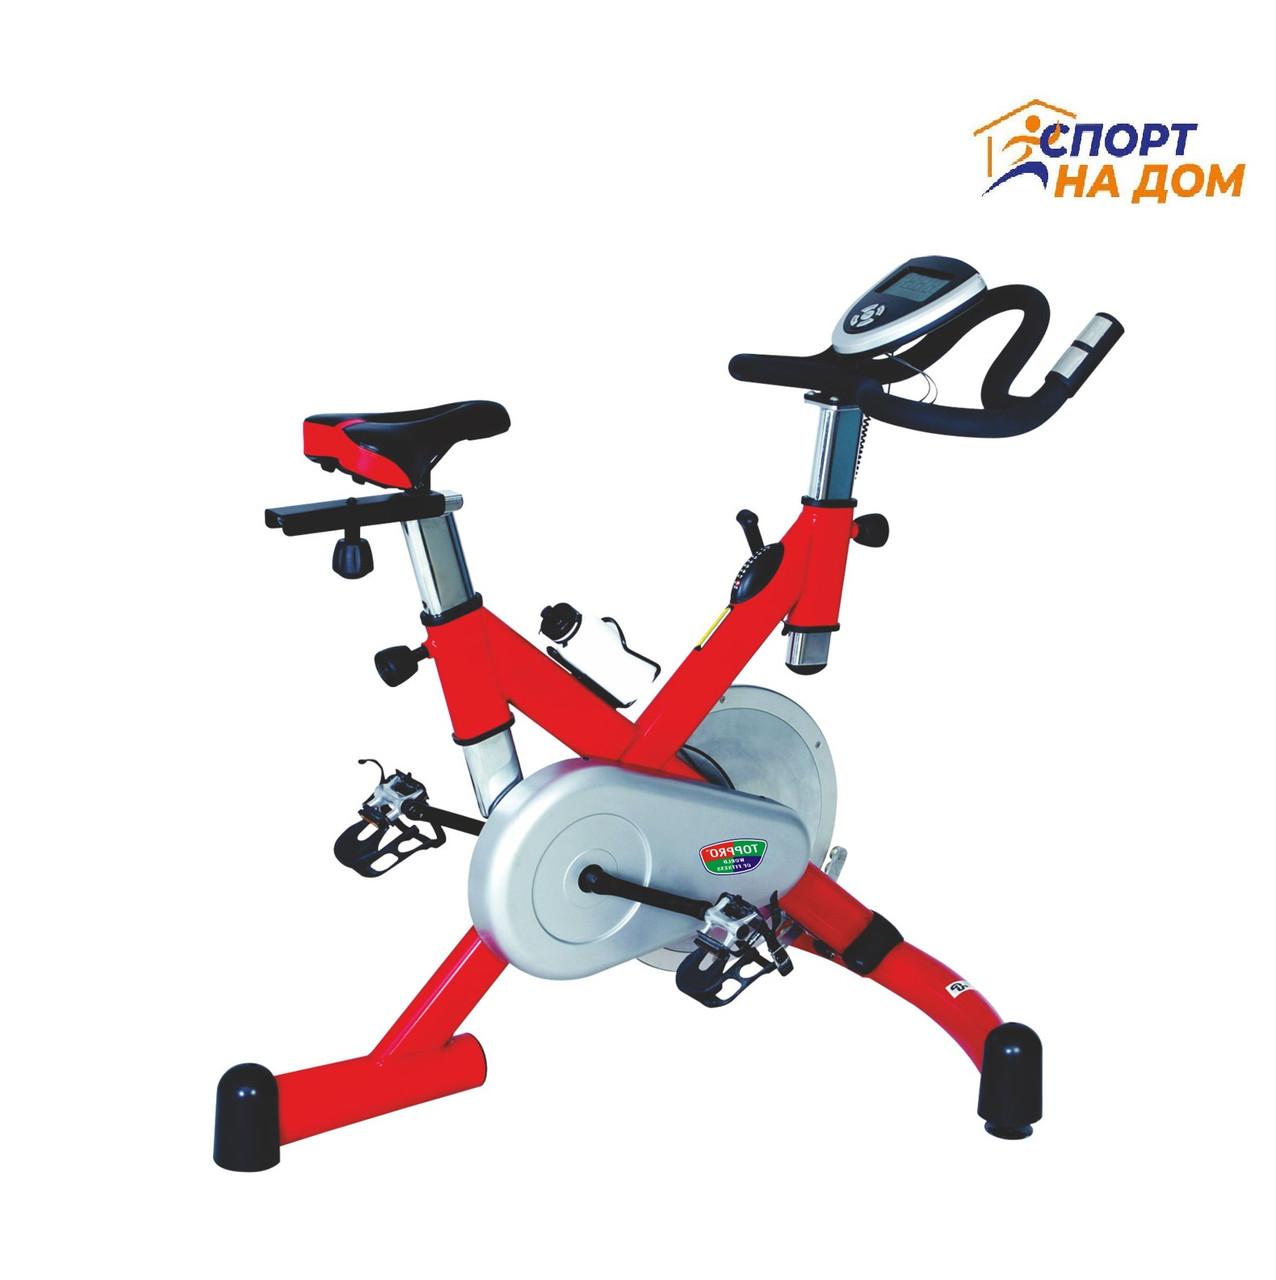 Тренажер Spin Bike A902 для сайкл экстрима до 150 кг